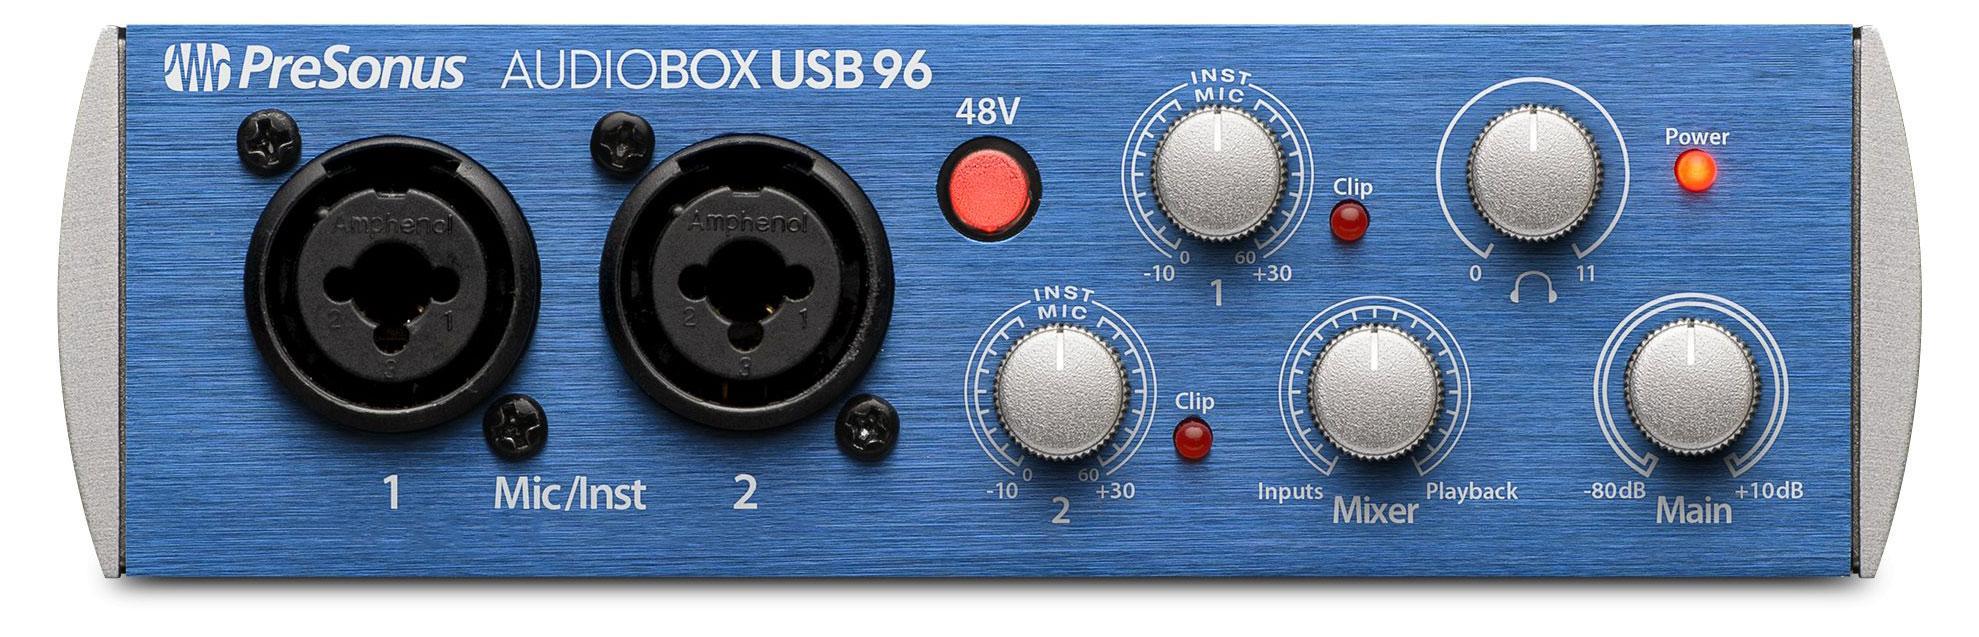 Pchardware - PreSonus AudioBox USB 96 - Onlineshop Musikhaus Kirstein